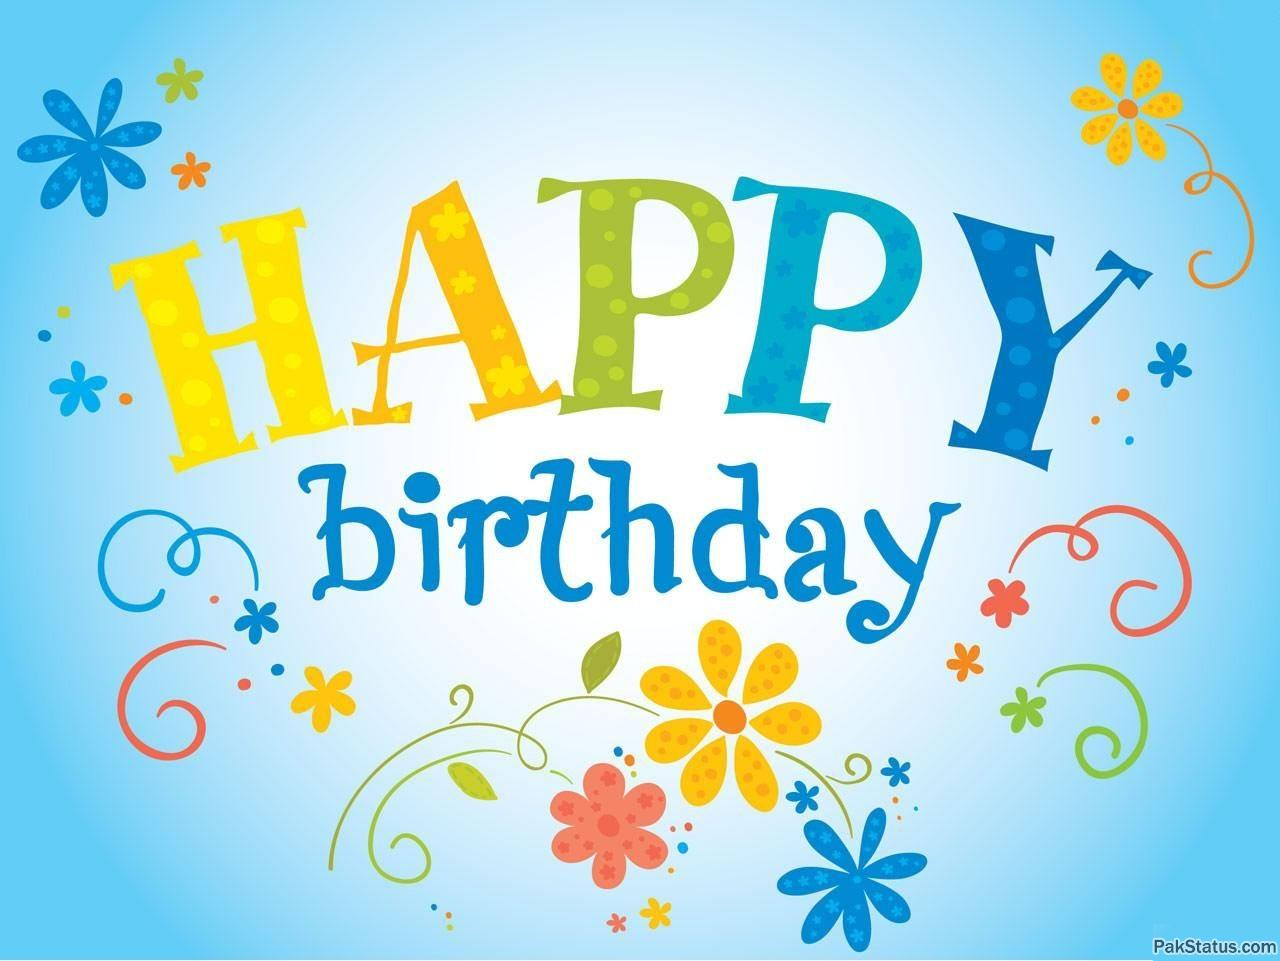 Happy Birthday Wishes Wallpapers 12   PAK Status 1280x961